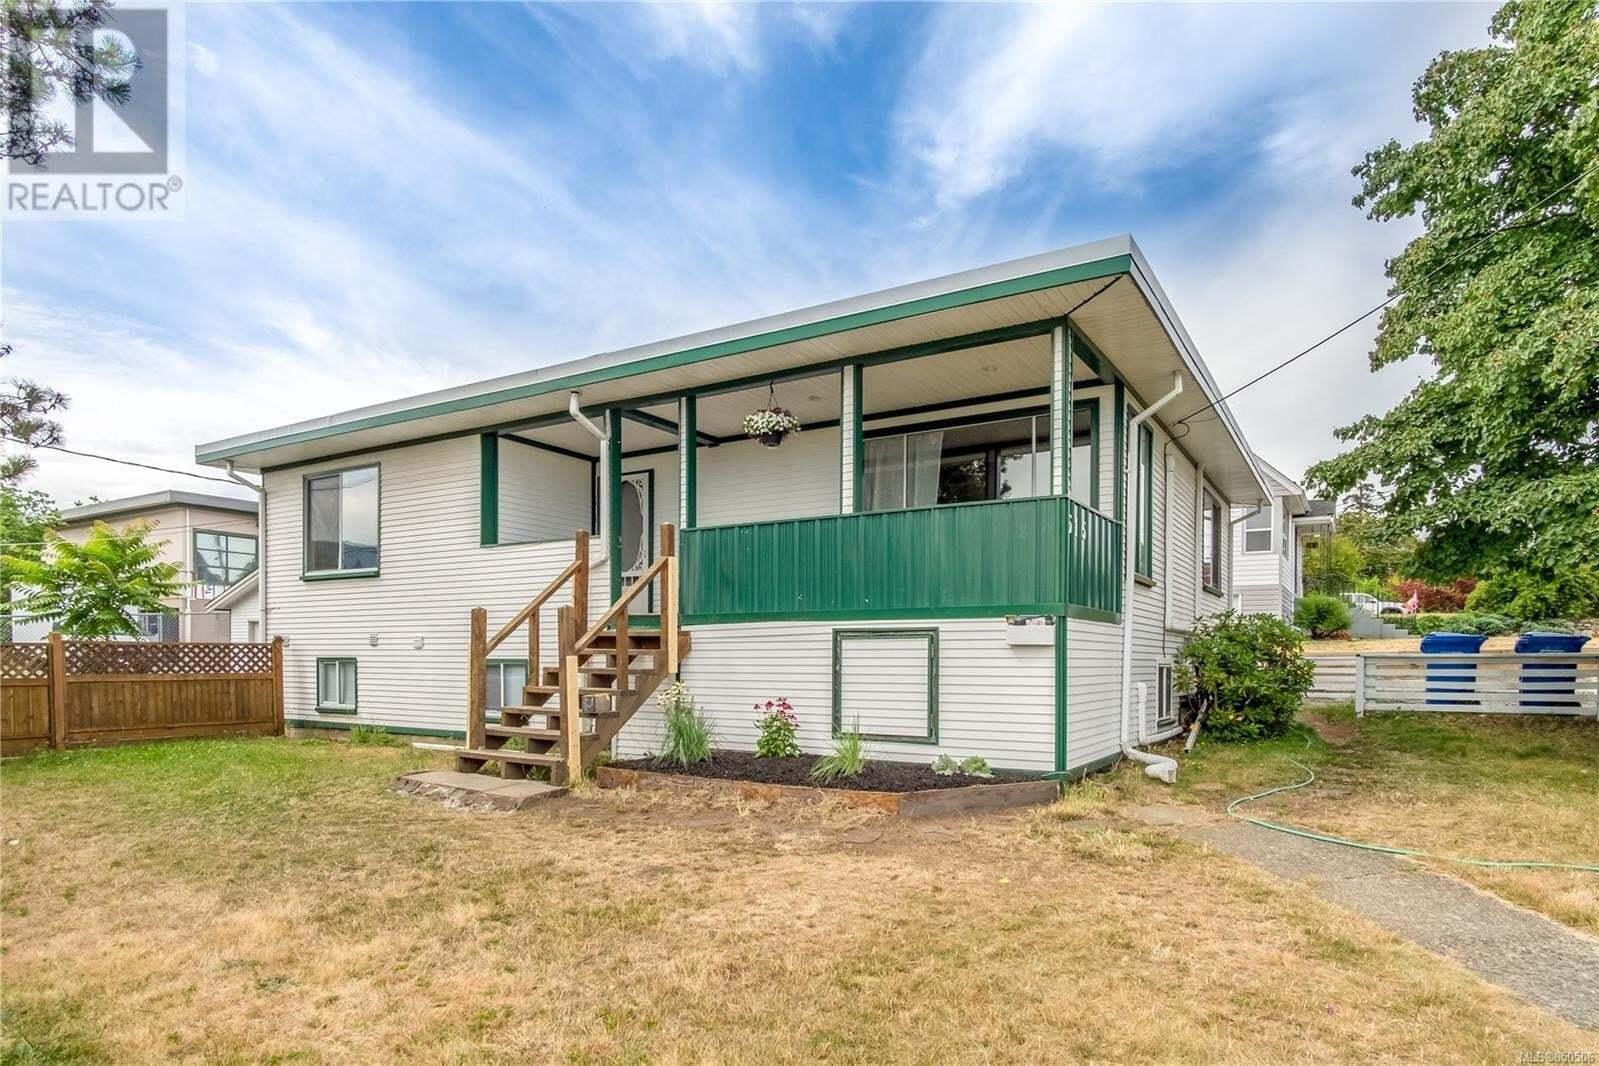 House for sale at 515 Northumberland  Nanaimo British Columbia - MLS: 850506